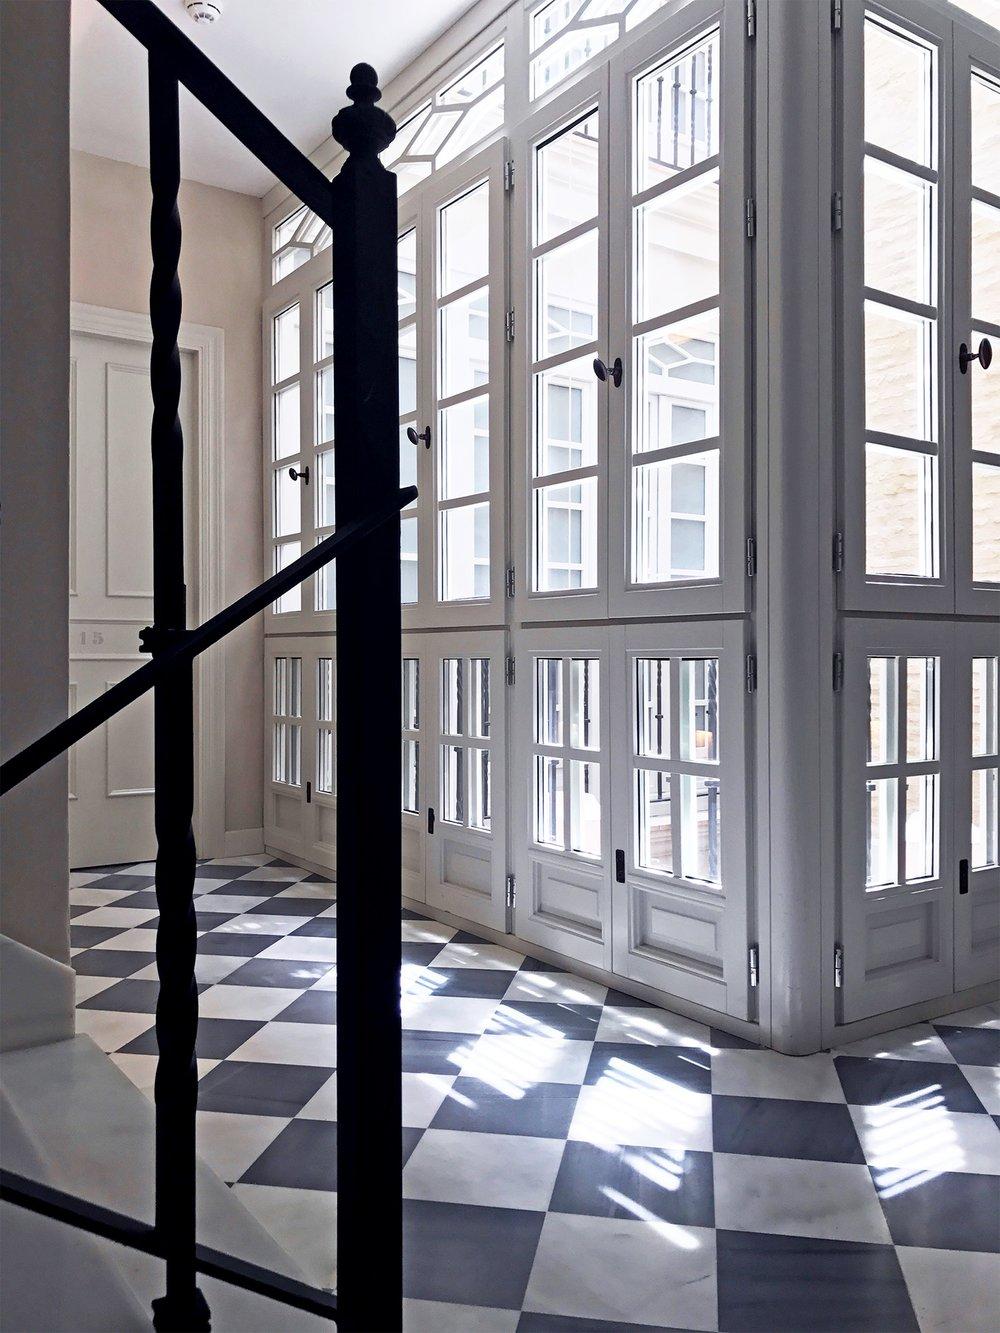 Corral del Rey hotel Seville Spain marble stairs.jpg